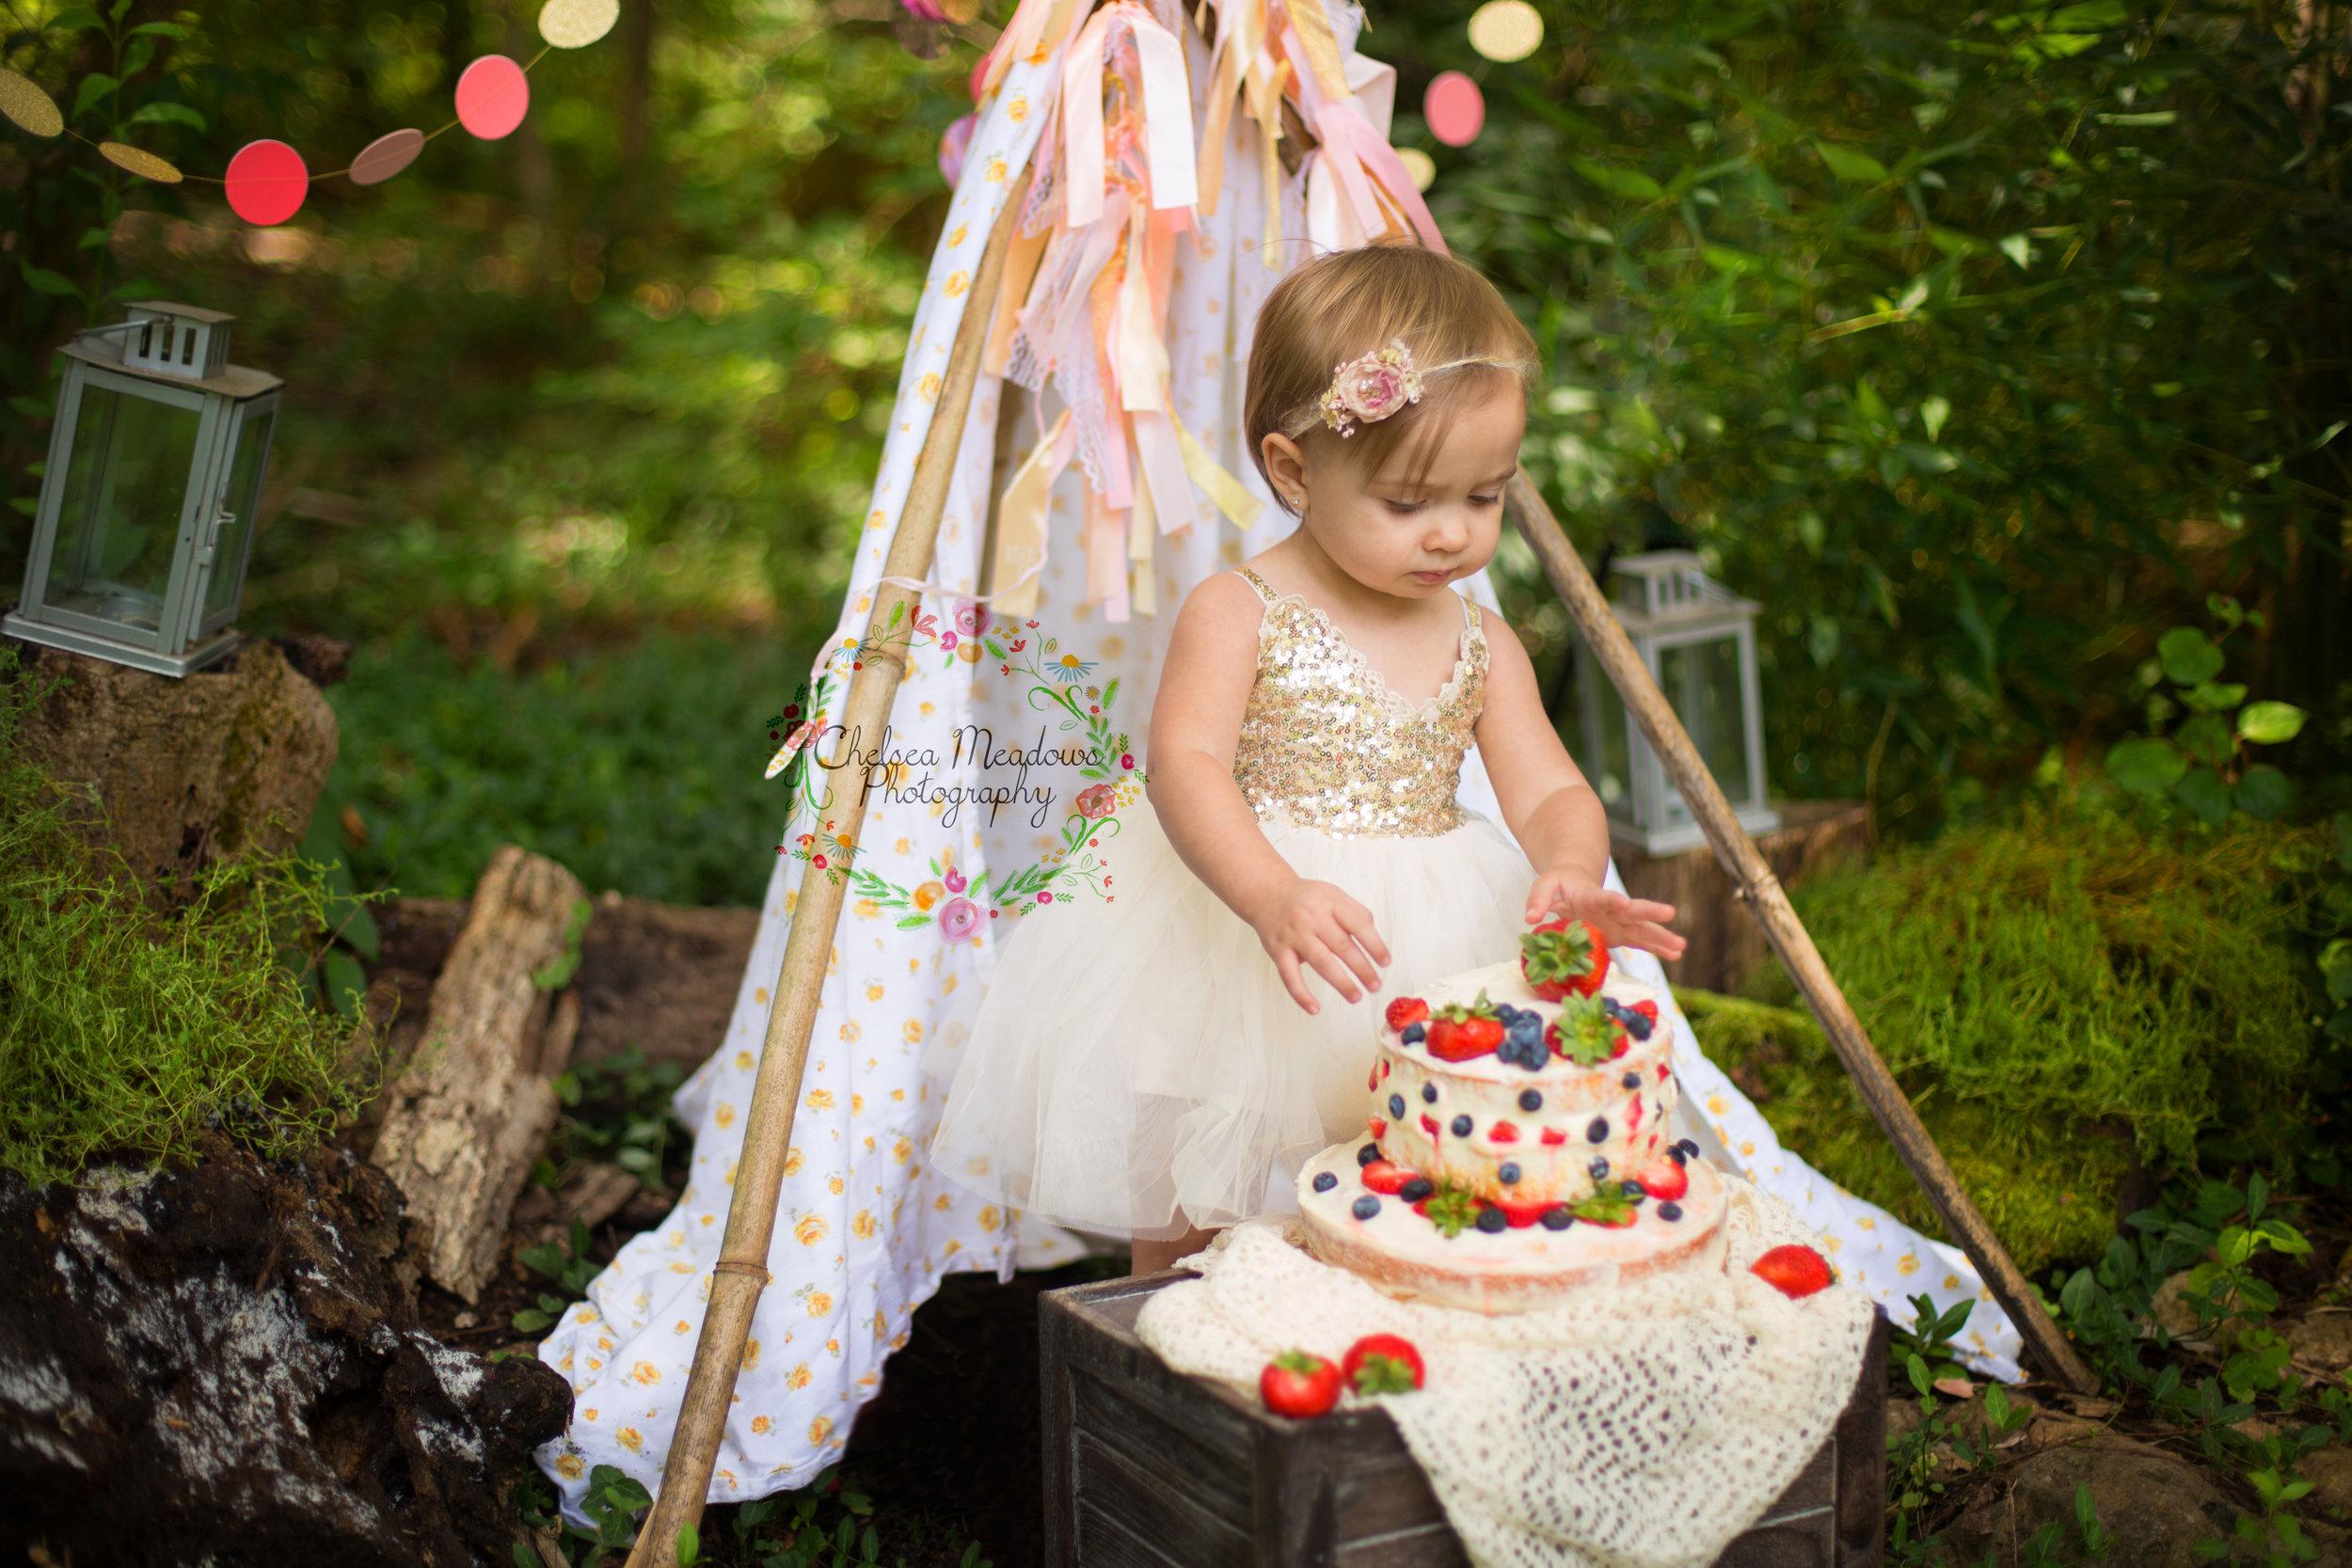 Paisley First Birthay Cake Smash - Nashville Family Photographer - Chelsea Meadows Photography (19).jpg